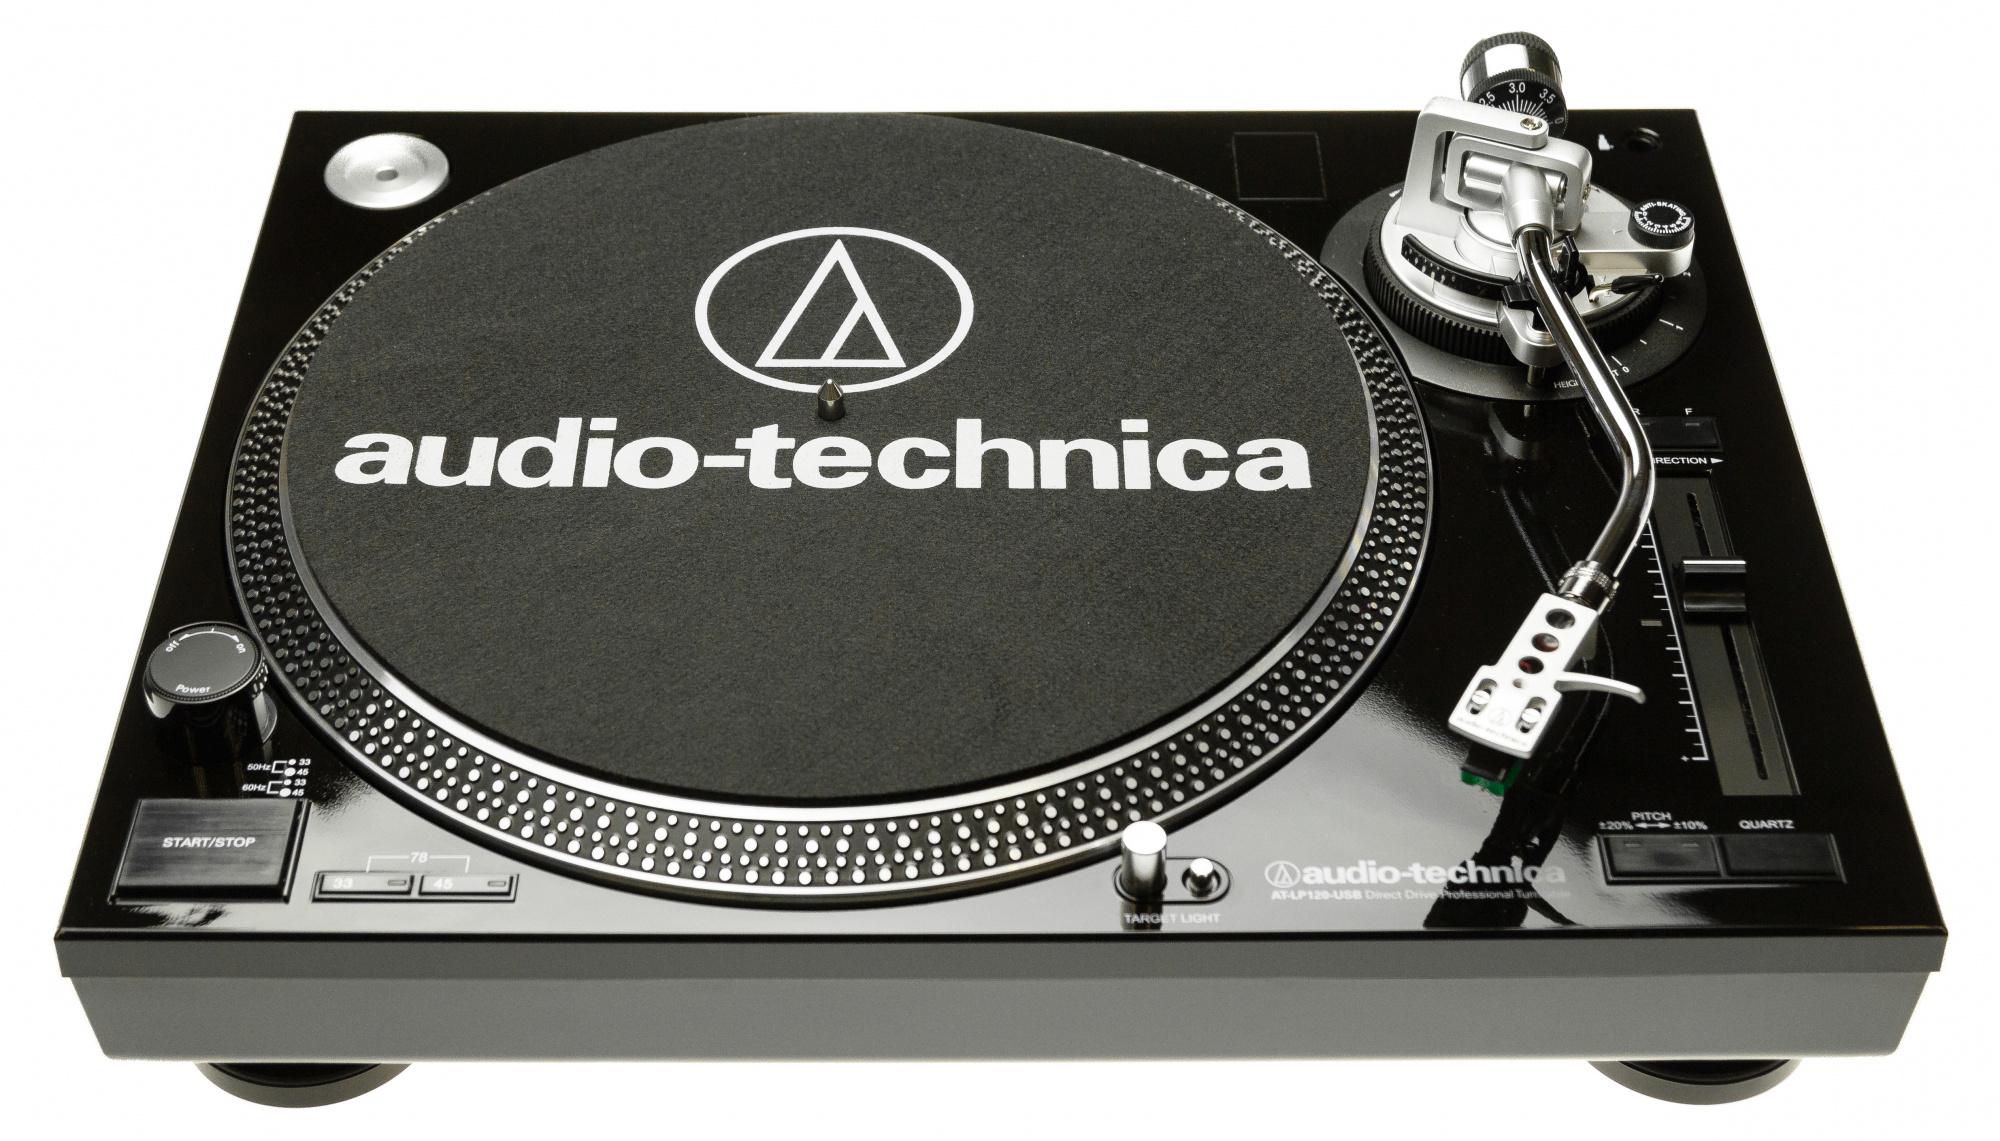 Audio-Technica AT-LP120USBHC - проигрыватель виниловых пластинок (Black)